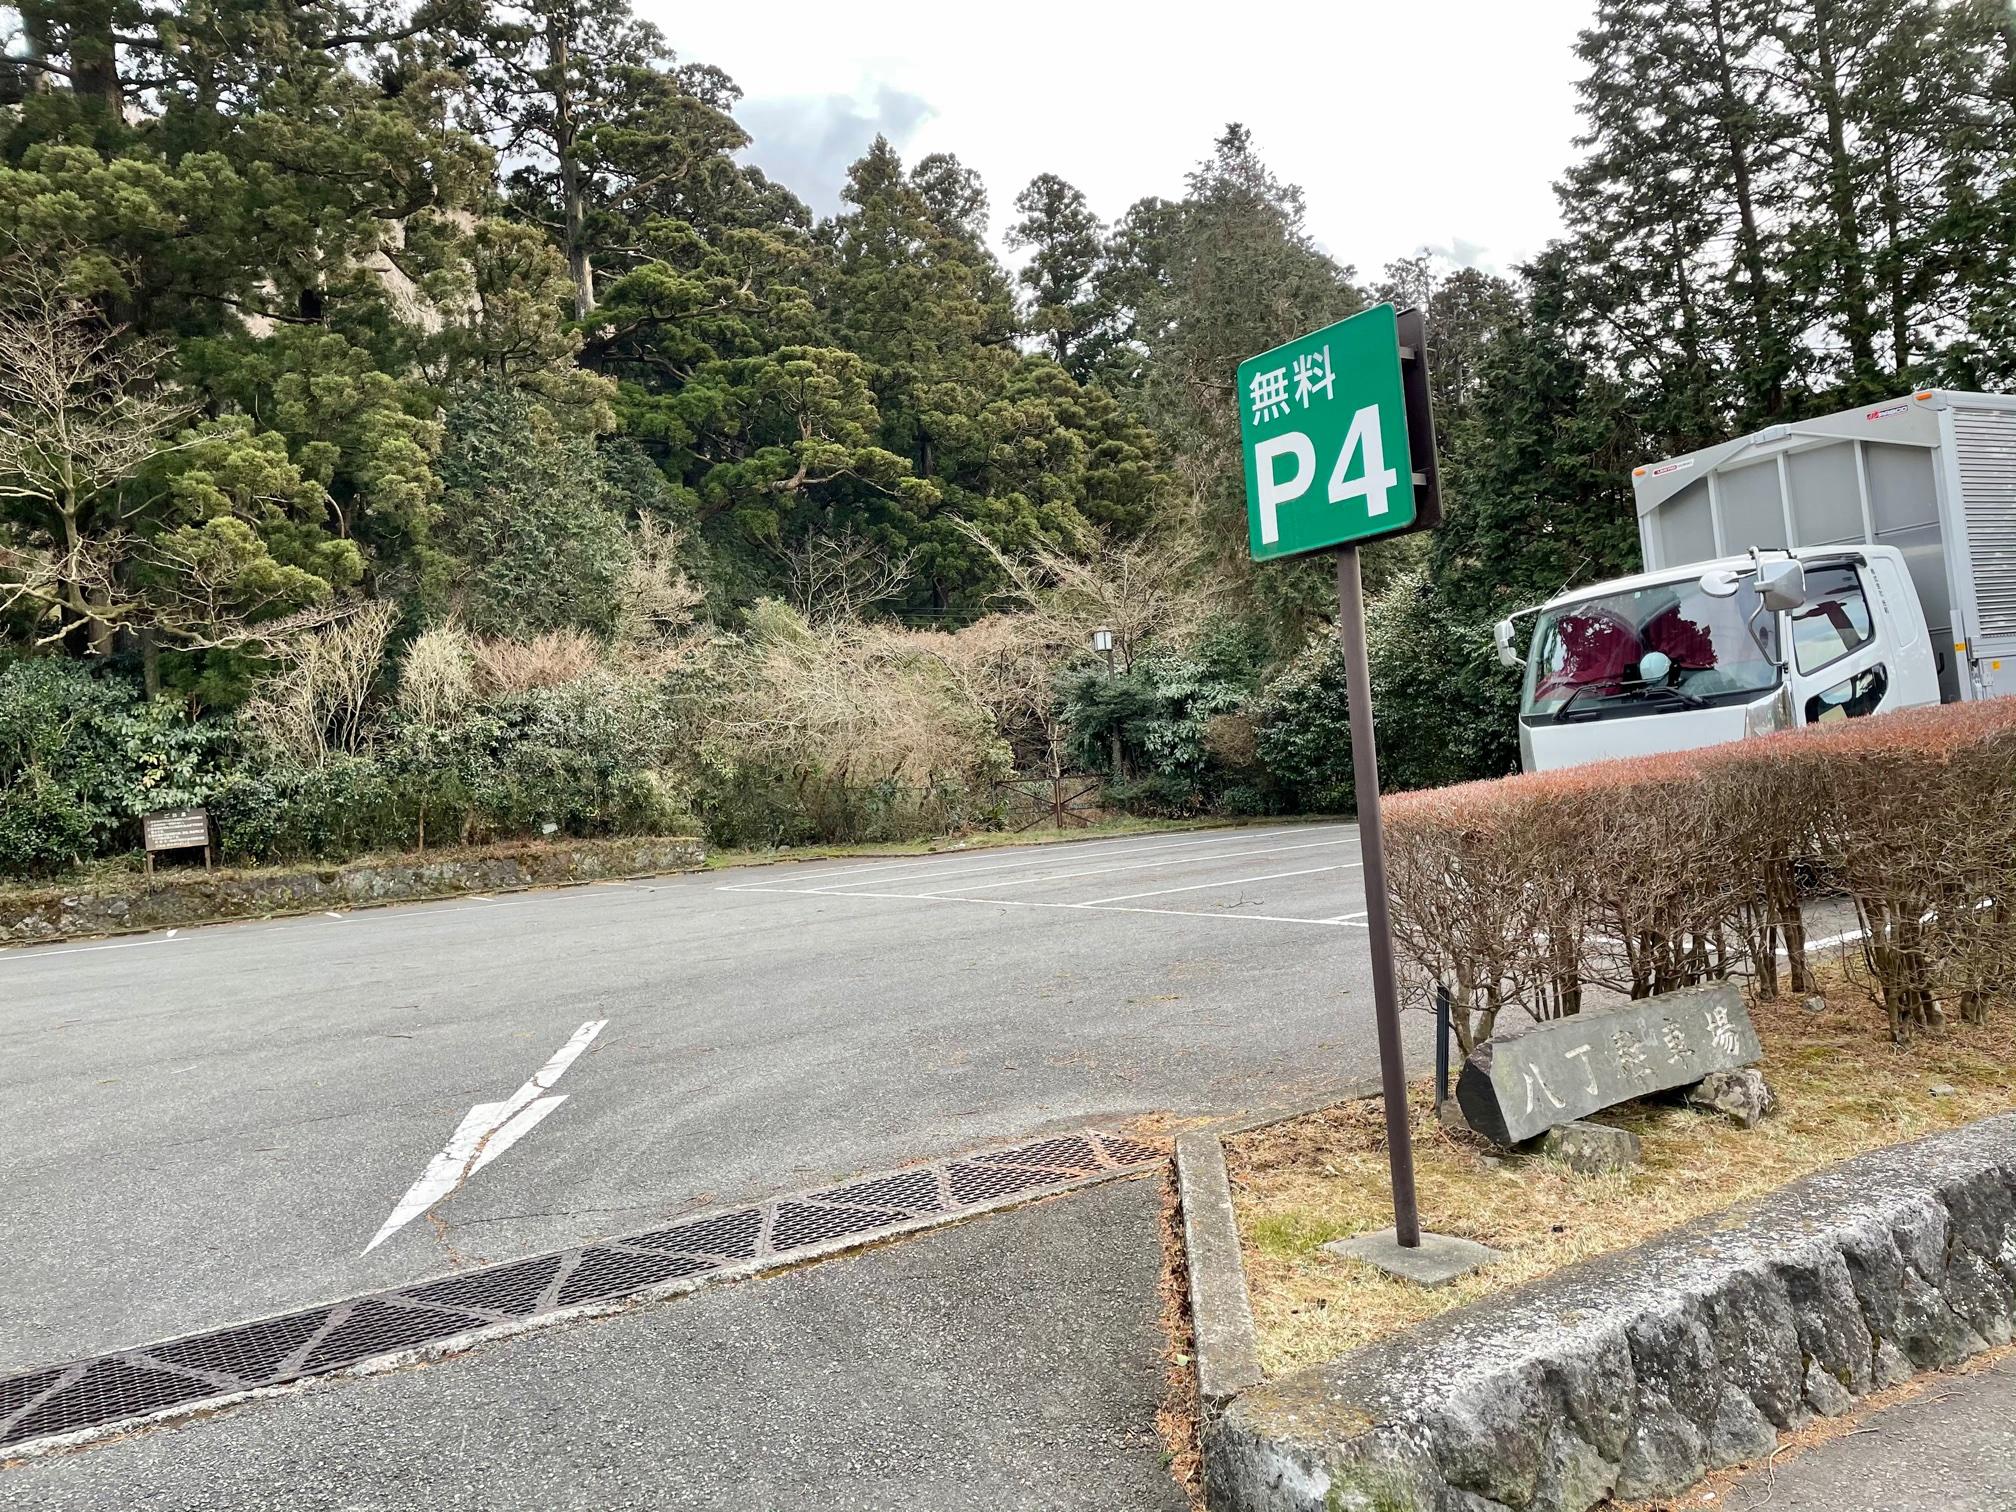 元箱根の無料駐車場